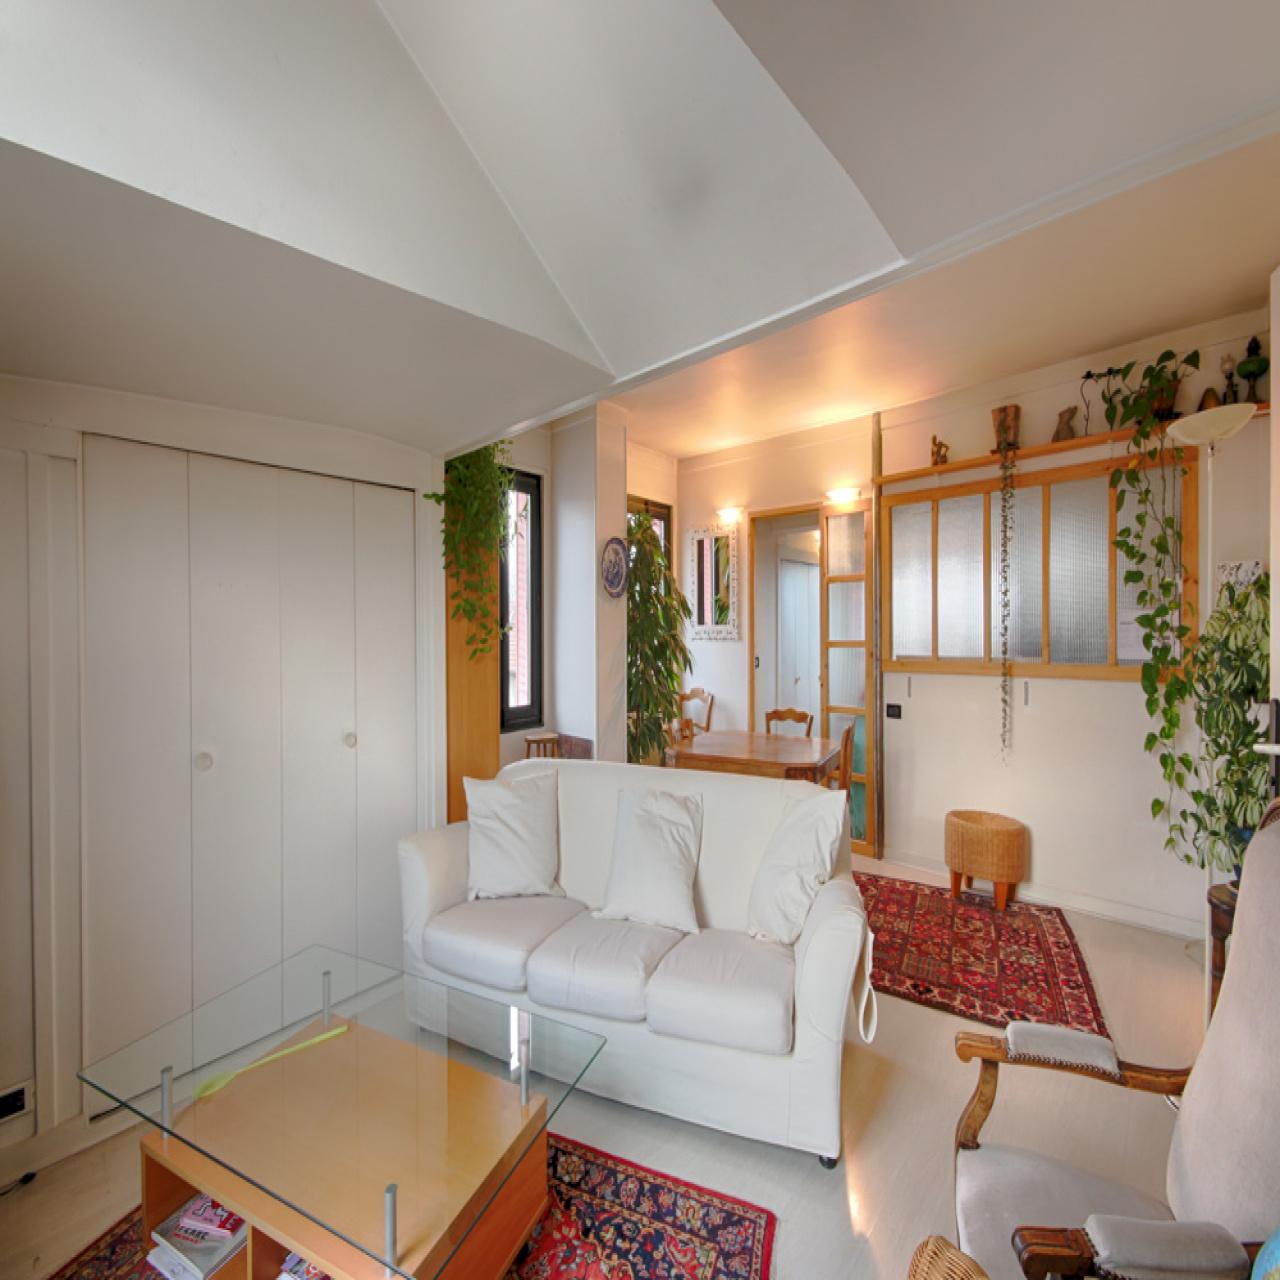 Image_5, Appartement, Cran-Gevrier, ref :FI3119